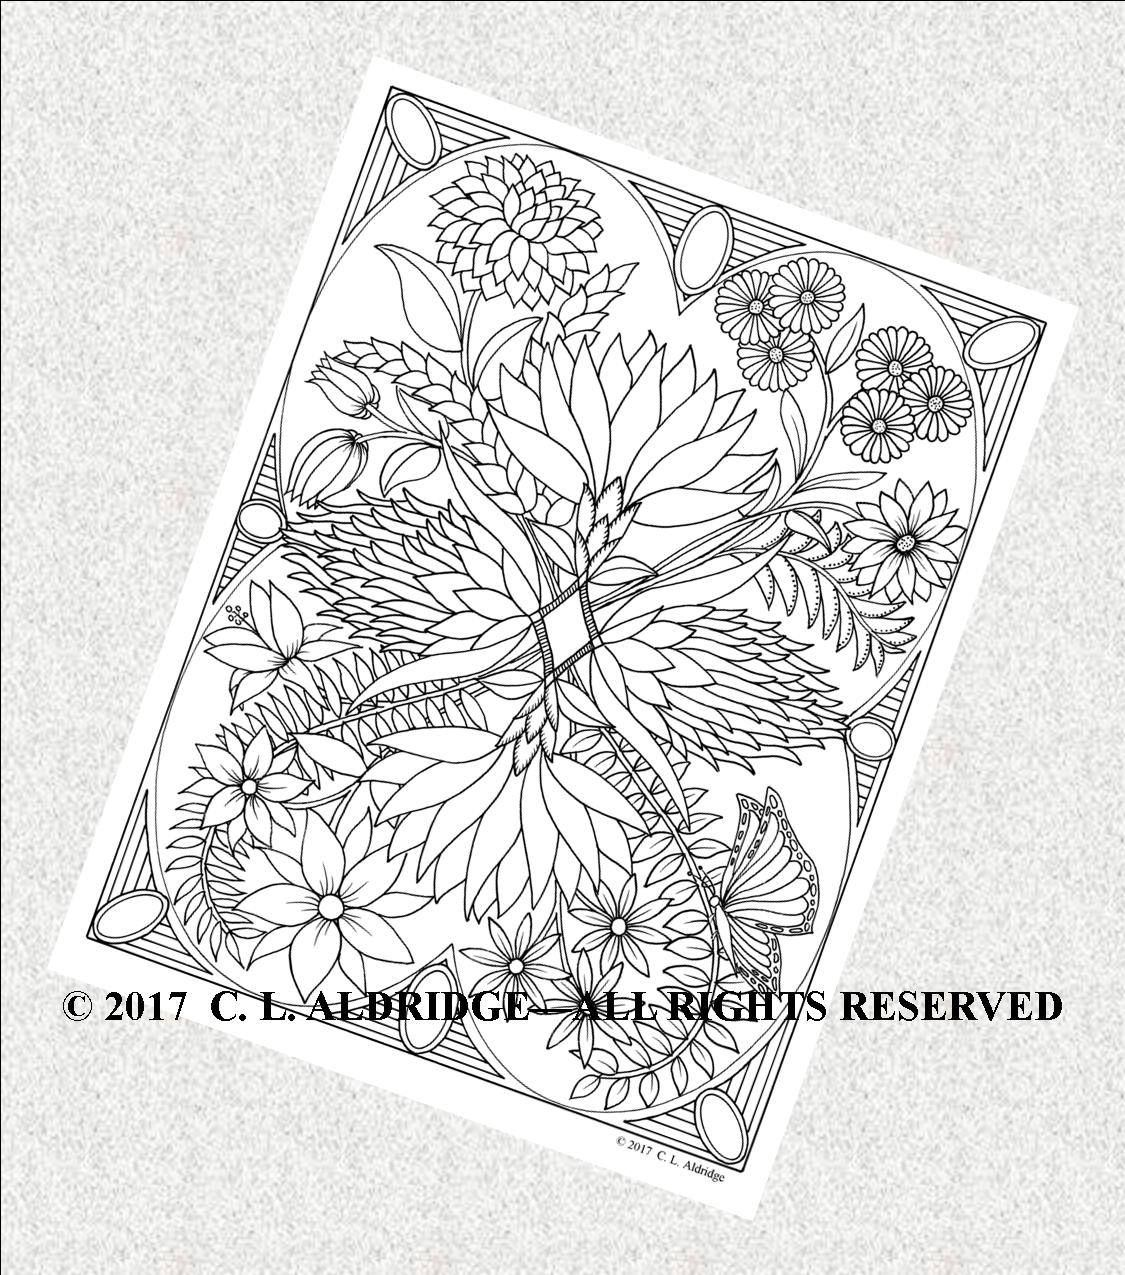 Fantasy flower garden coloring page by claldridgeart on etsy